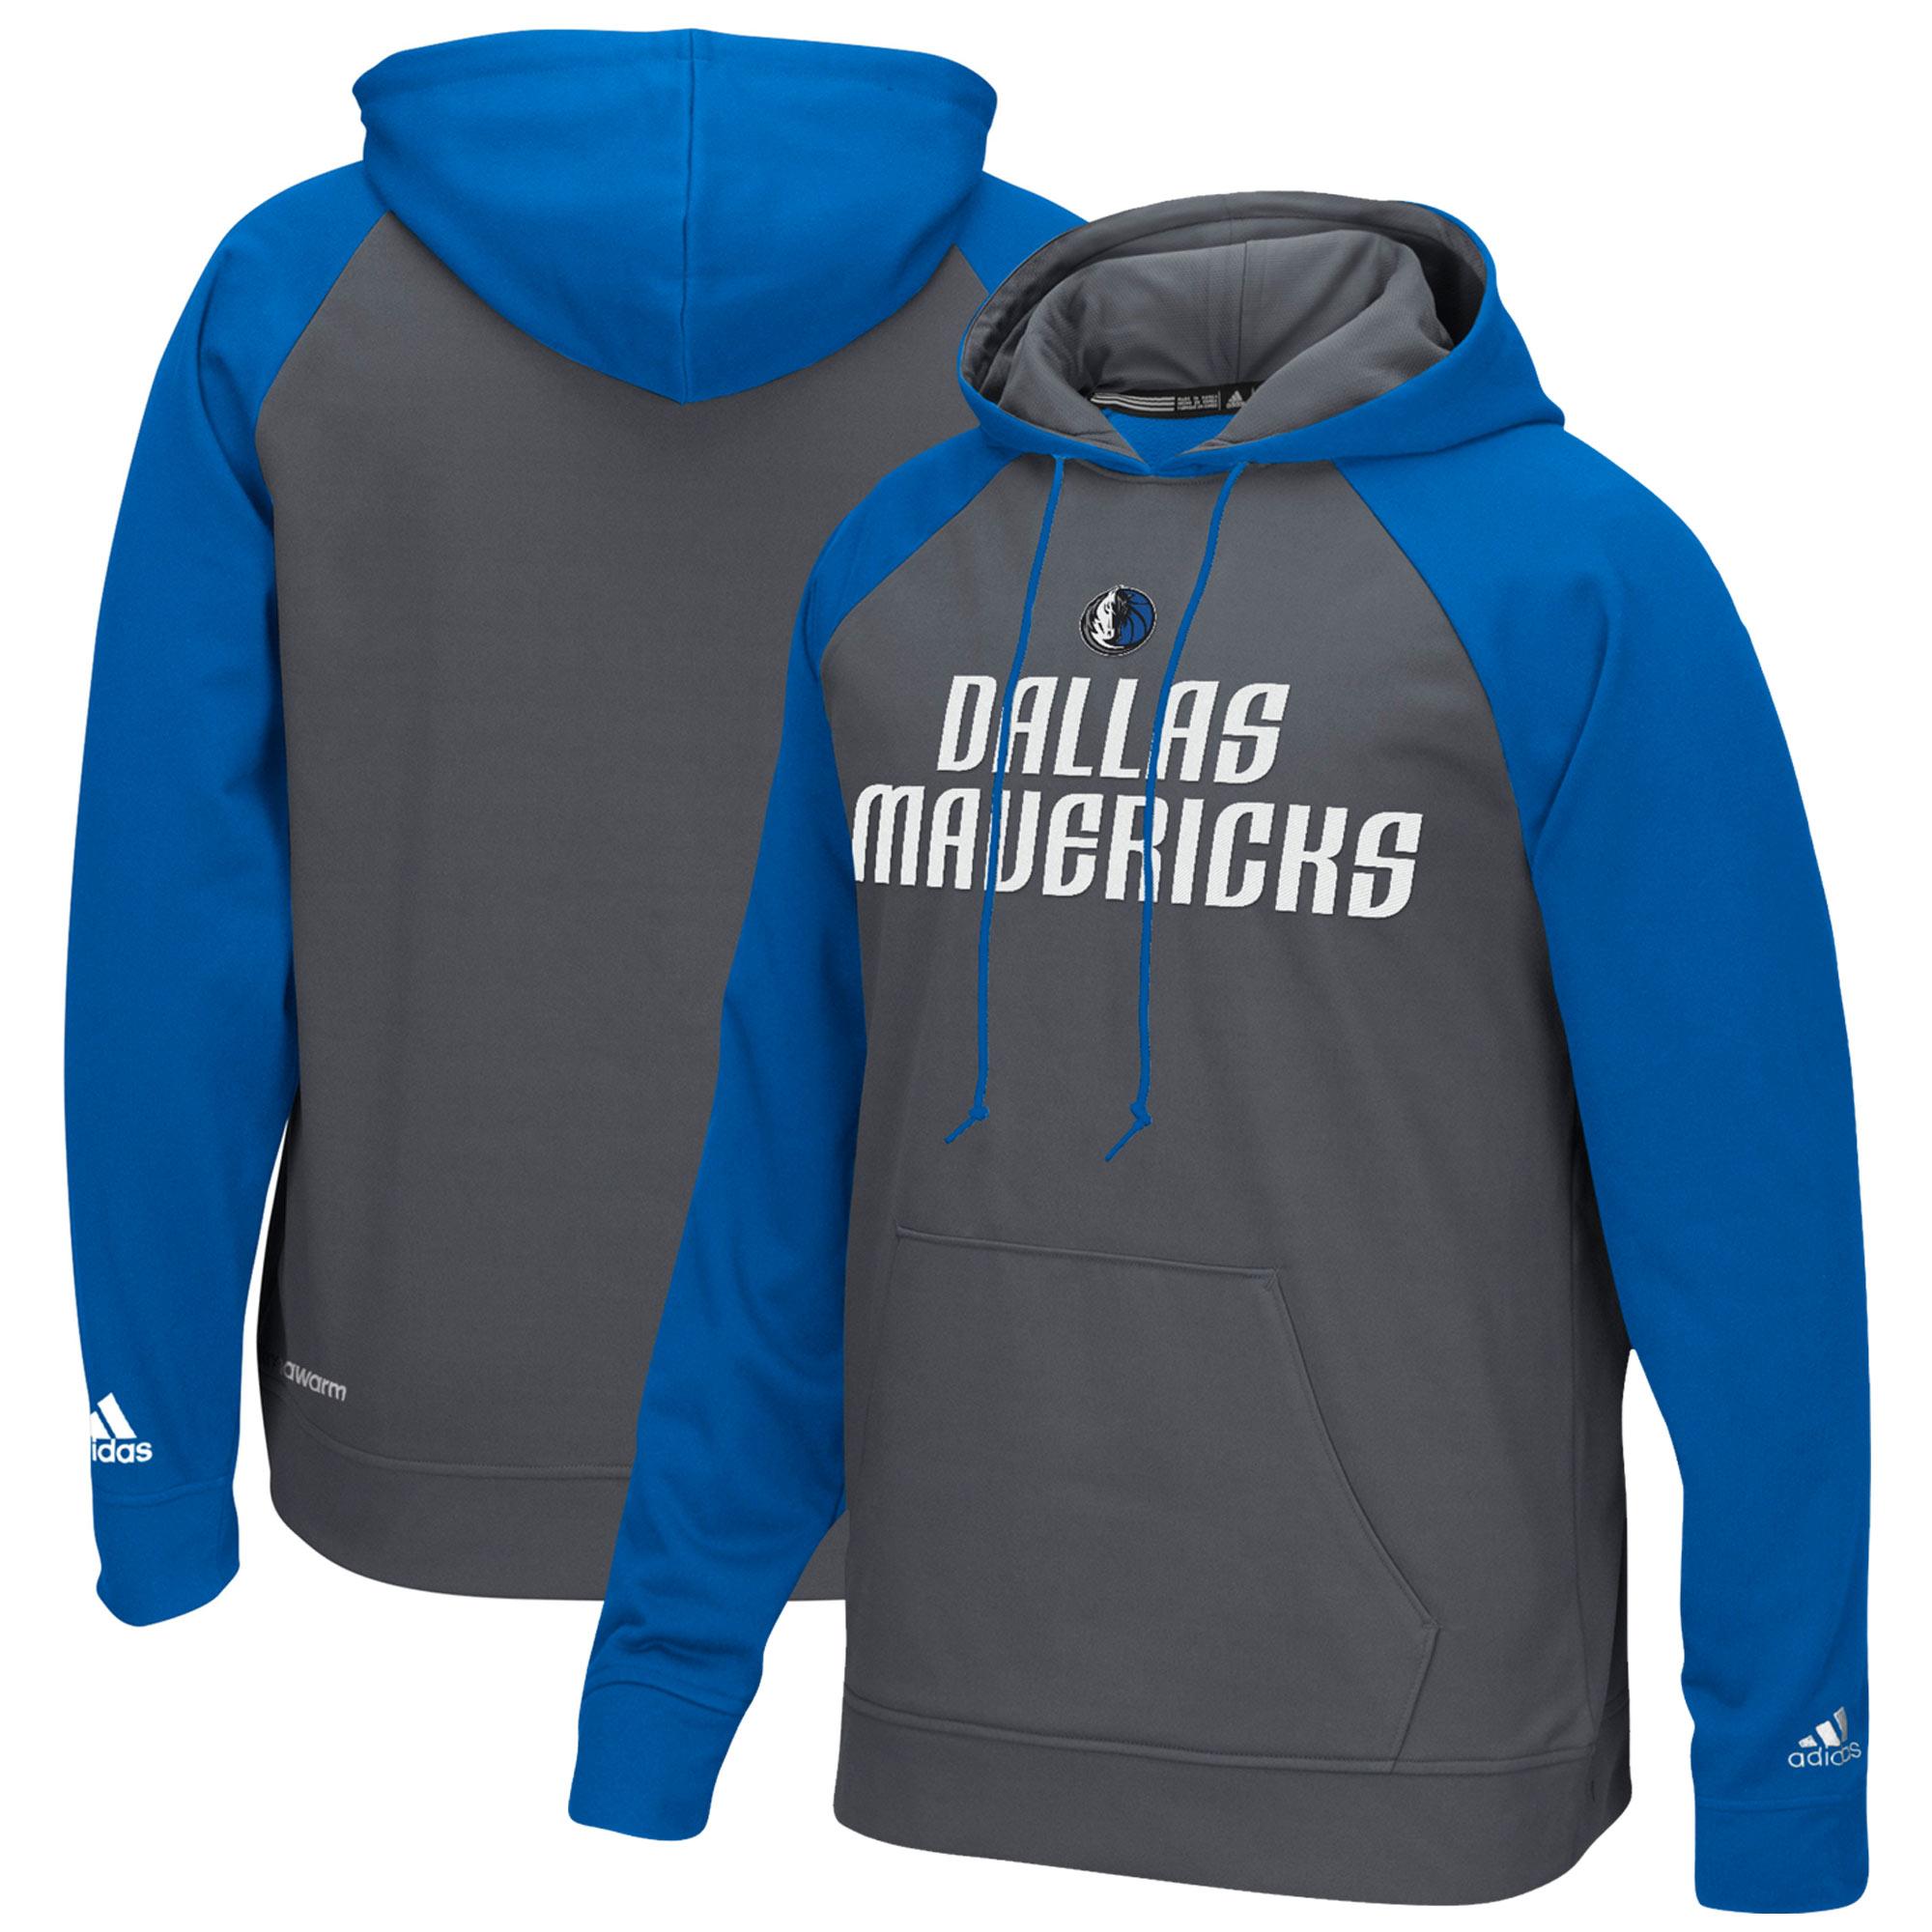 Dallas Mavericks adidas 2016 Tip-Off Pullover Hoodie - Gray/Blue